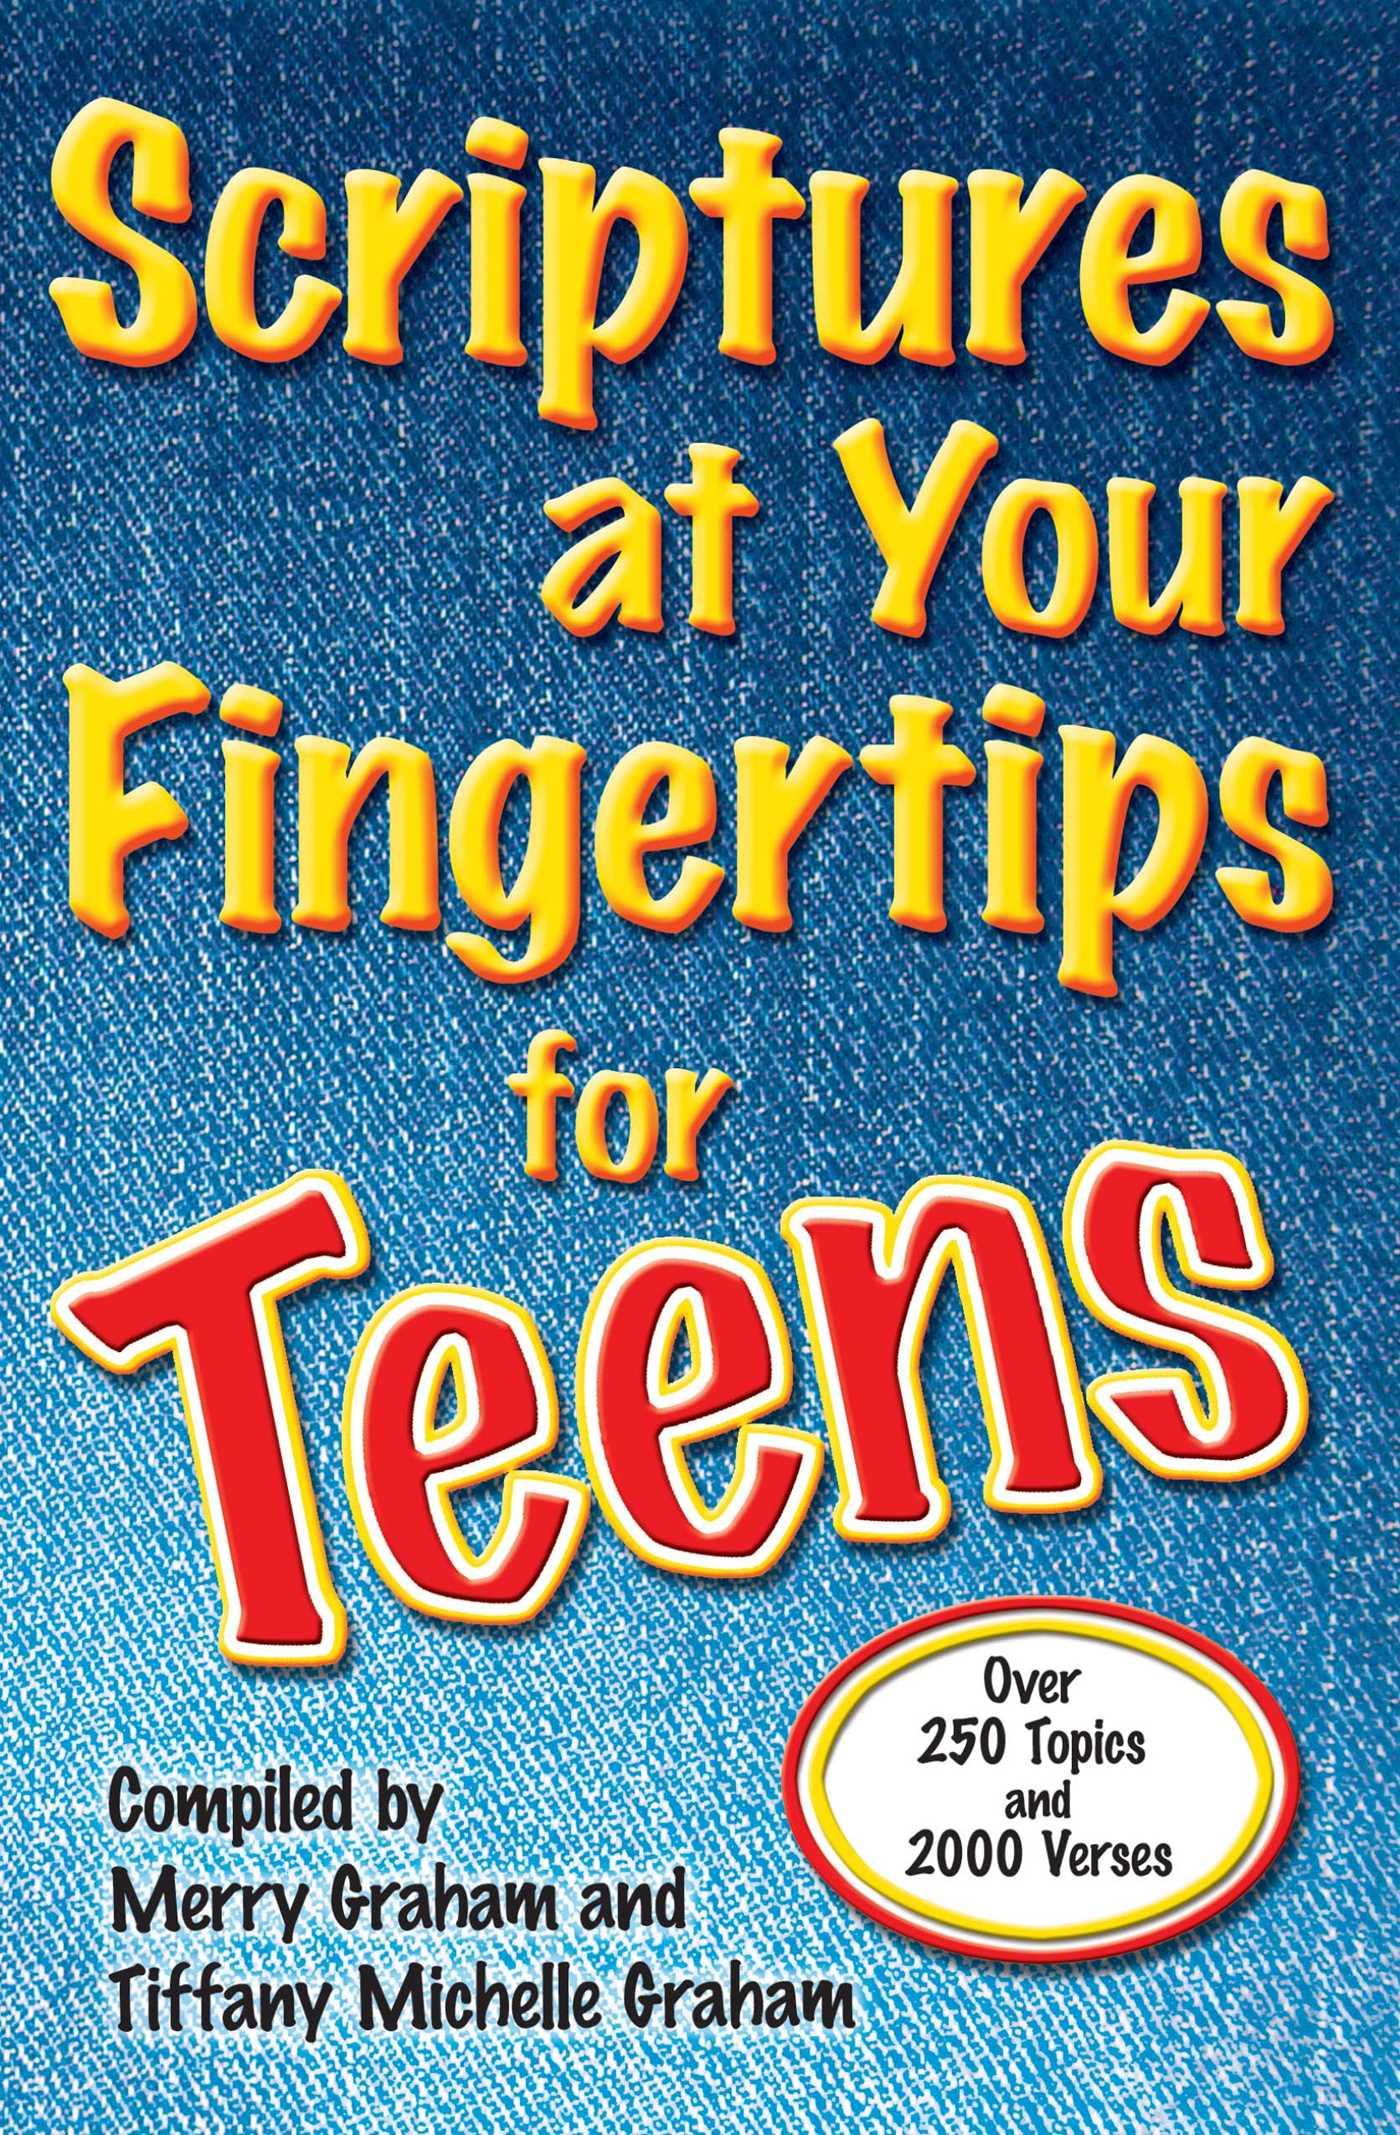 Scriptures at your fingertips for teens 9781416579106 hr